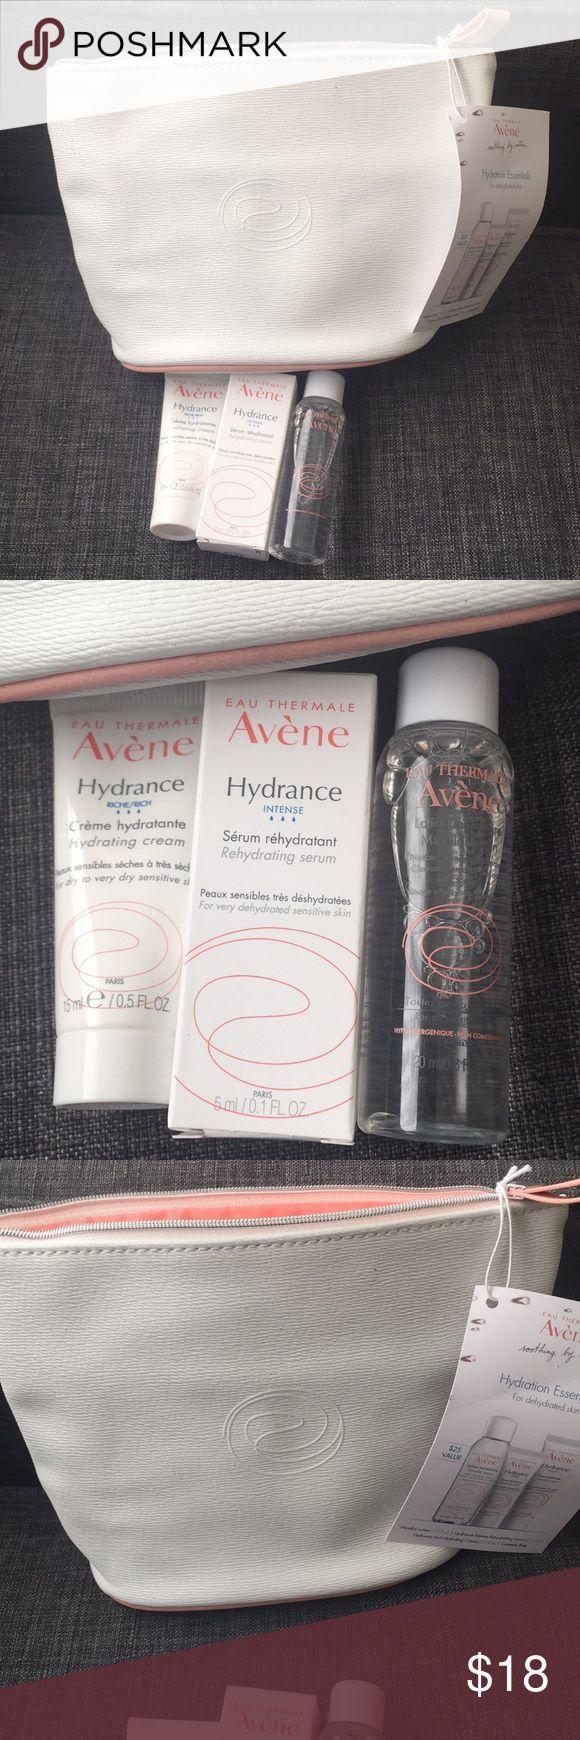 Avene Hydrating travel set BNWT, hydrating travel set with bag. Avène skin care. Micelar lotion .6 fl oz, Hydrance Intense Rehydrating Serum .1 fl oz, Hydrance Rich Hydrating Cream .5 fl oz. Avene Makeup